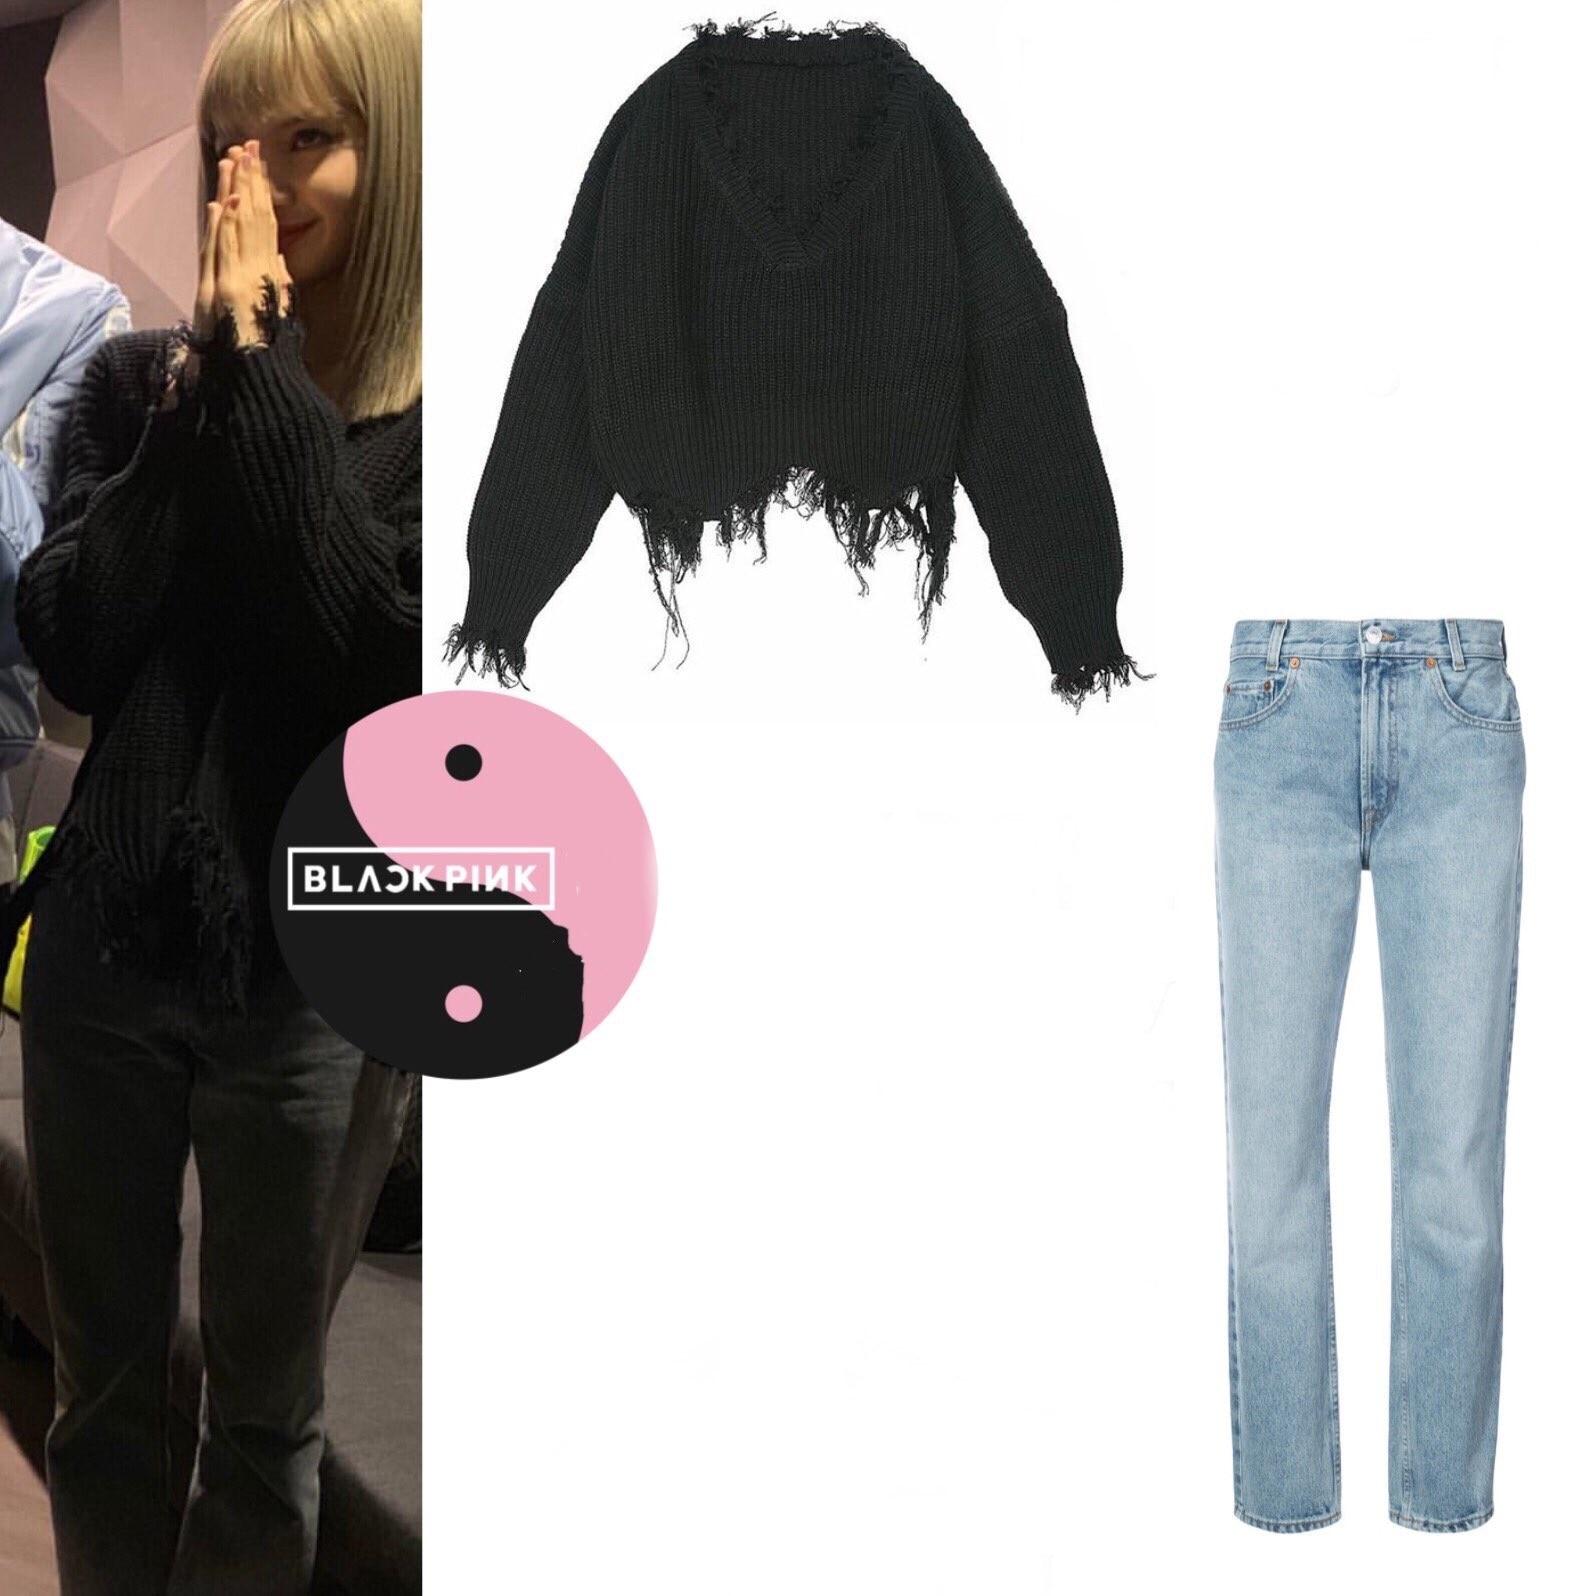 Kpop Blackpink Jennie Same Korean Black V-neck Pullover Short Knitted Sweater And Light Blue Straight Jeans Women Two-piece Set